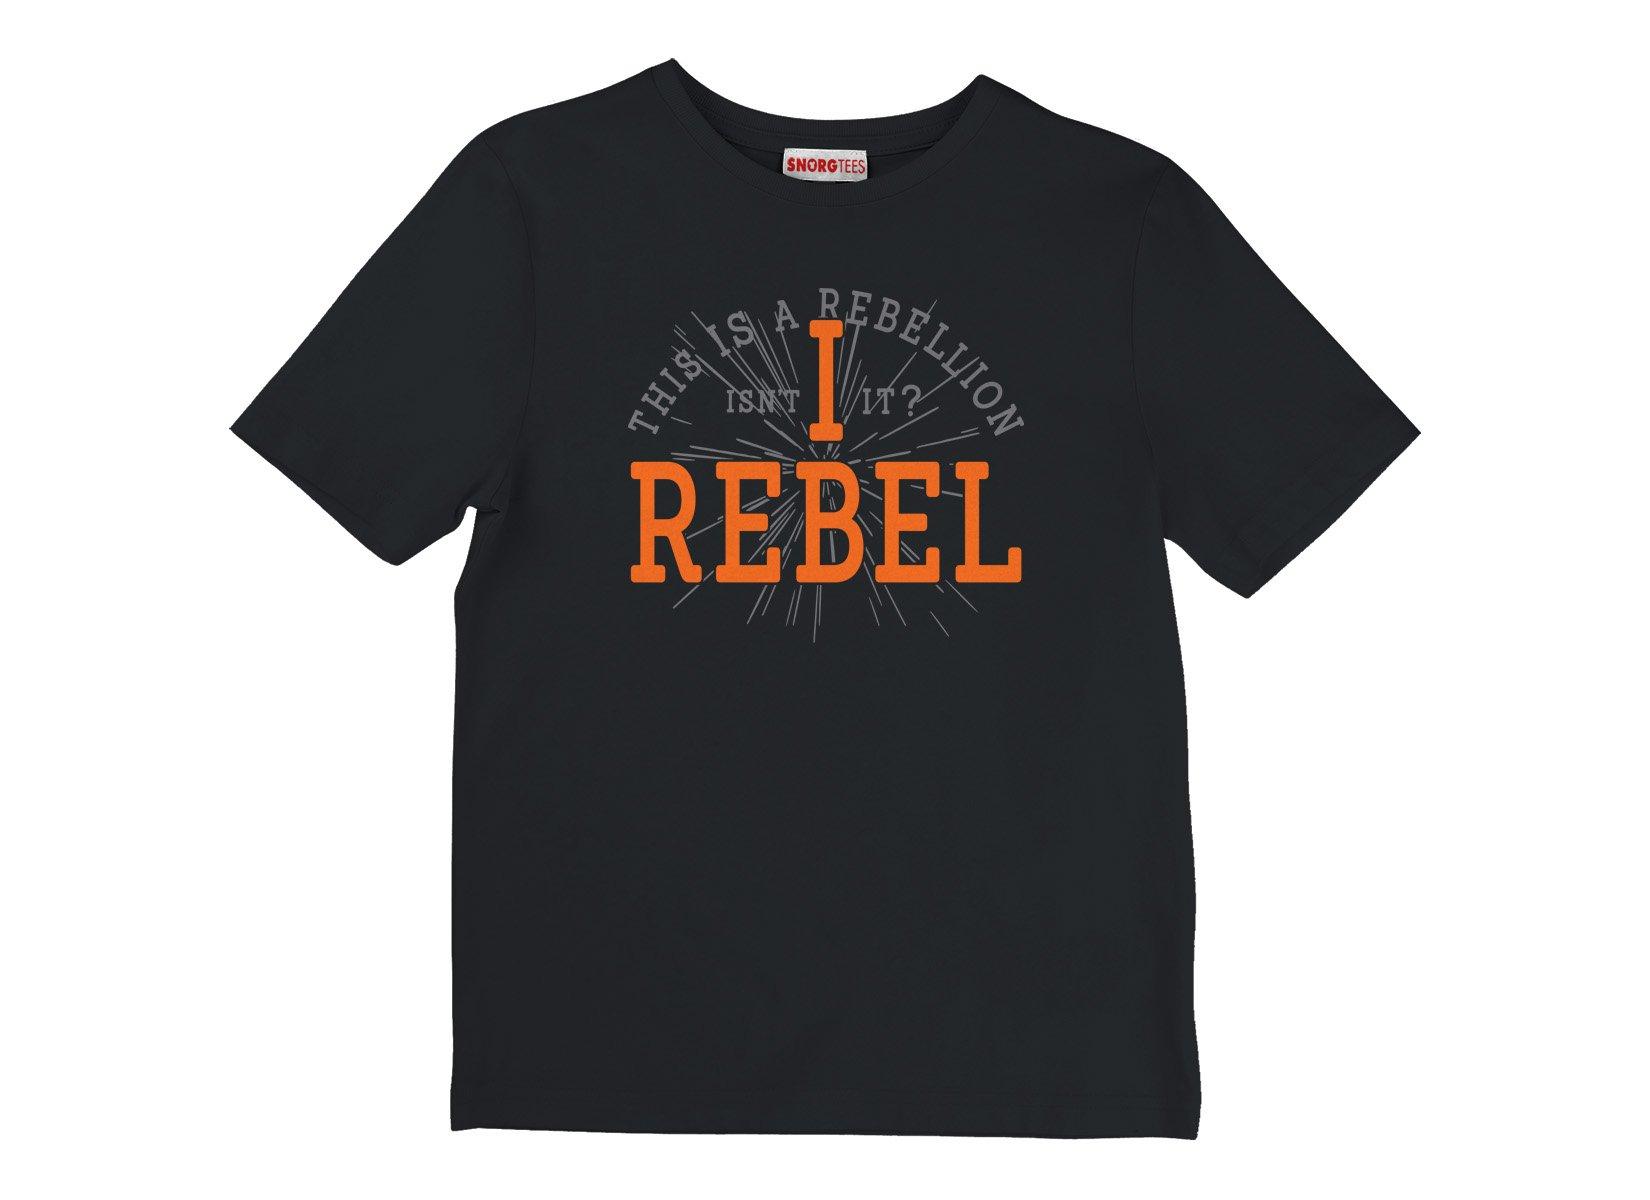 I Rebel on Kids T-Shirt